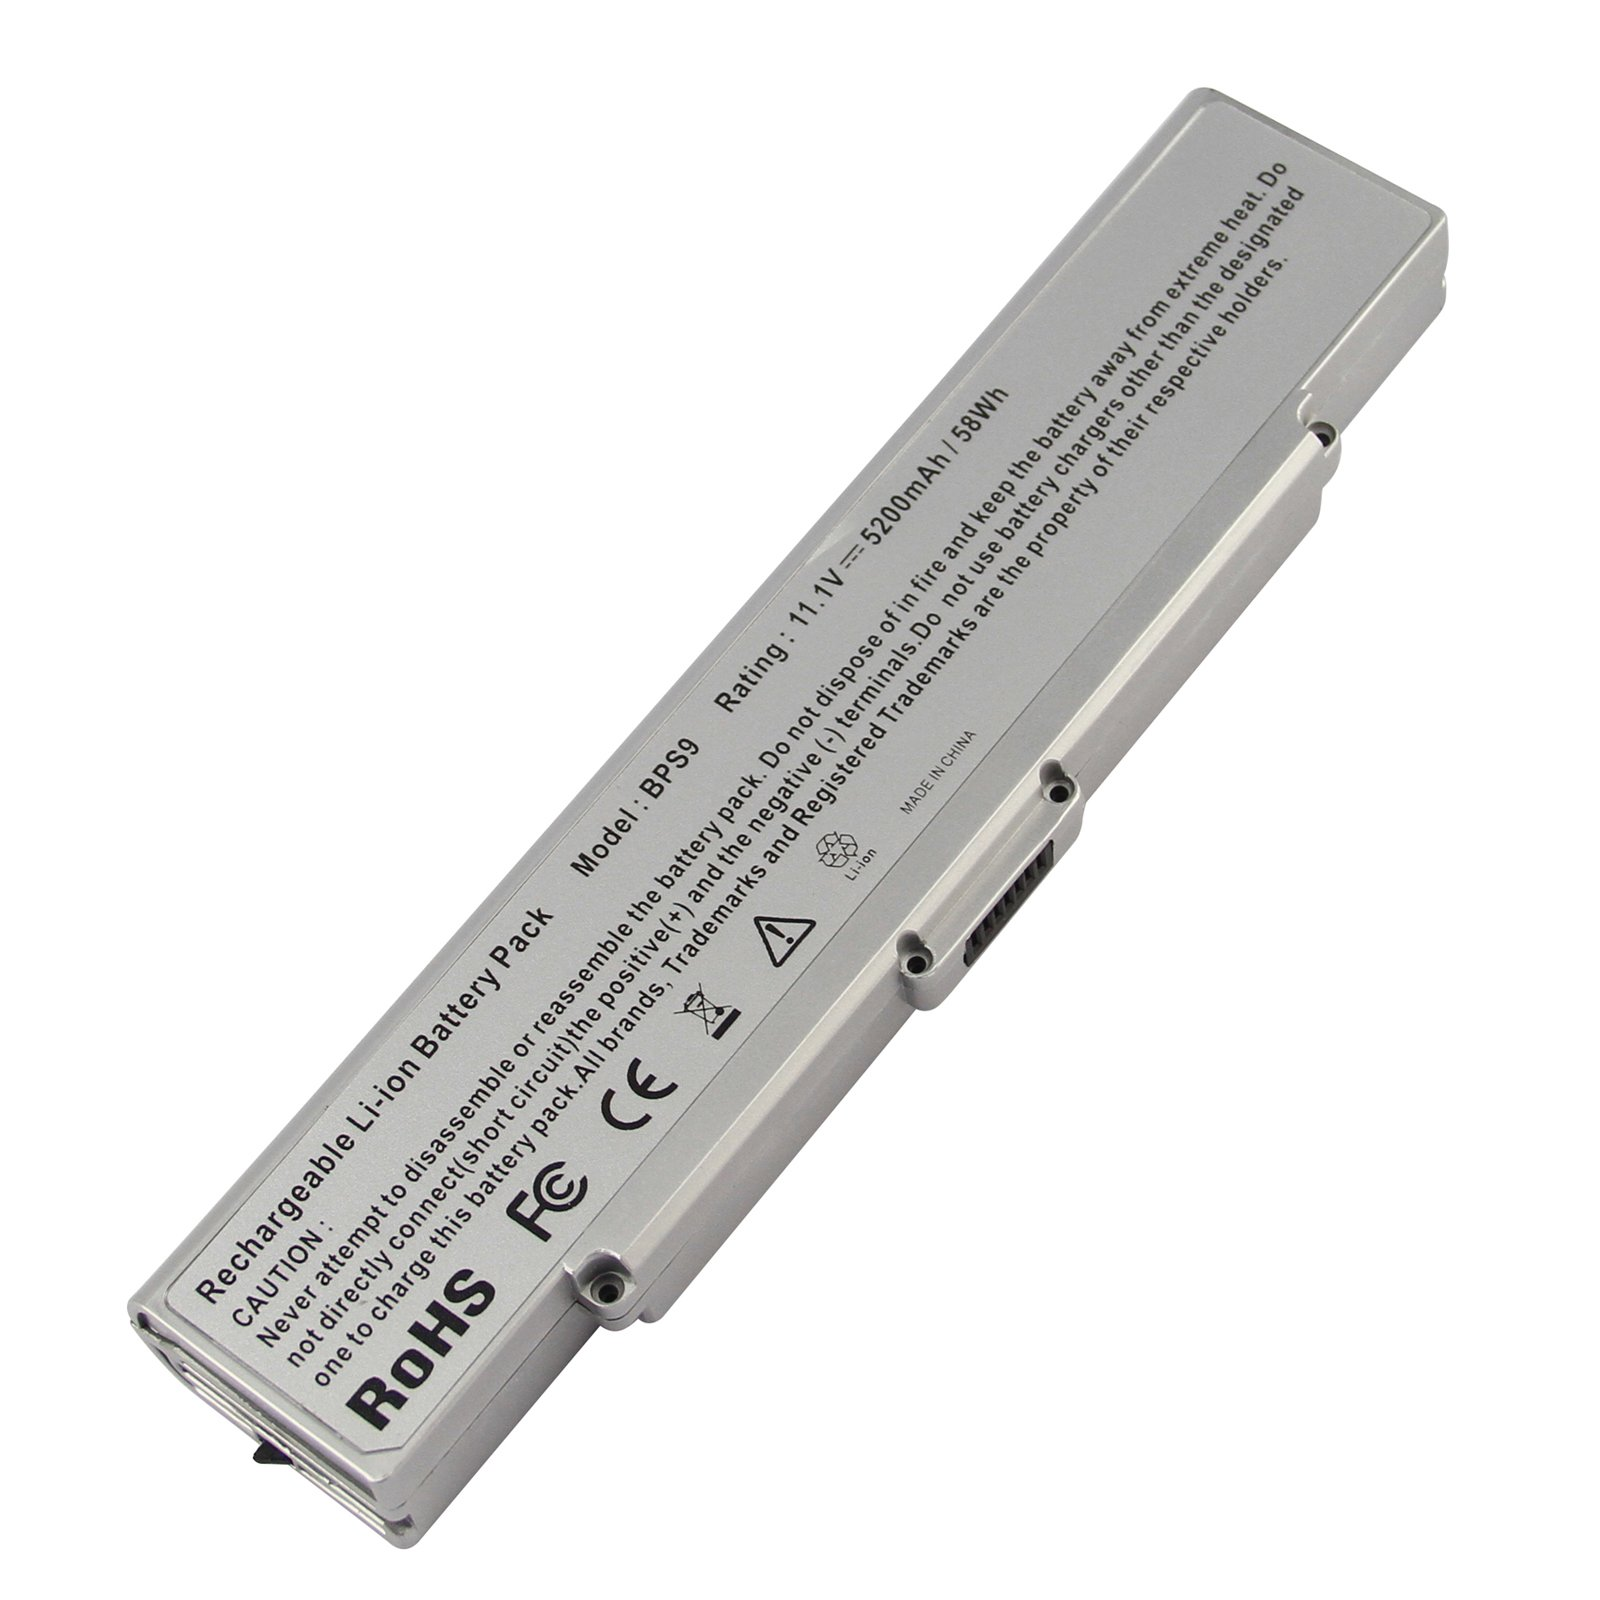 Bateria Para Sony Vaio Vgn-ar Vgn-cr Vgn-nr Vgp-bps9/b Vgp-bps9/s Silver